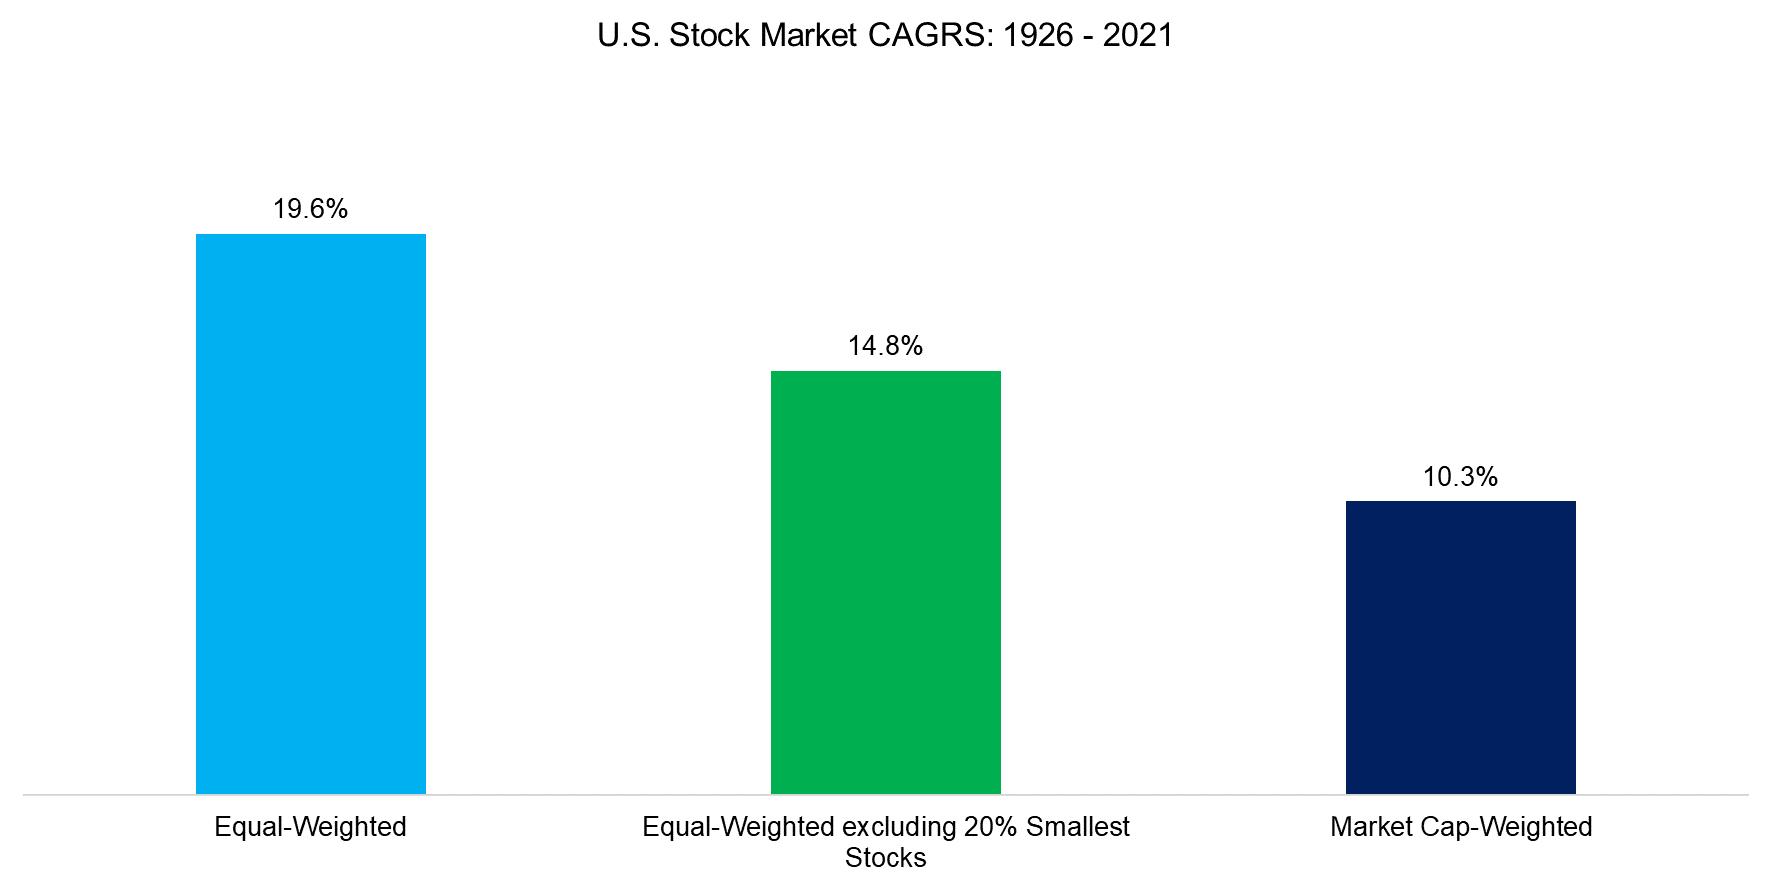 U.S. Stock Market CAGRS 1926 - 2021